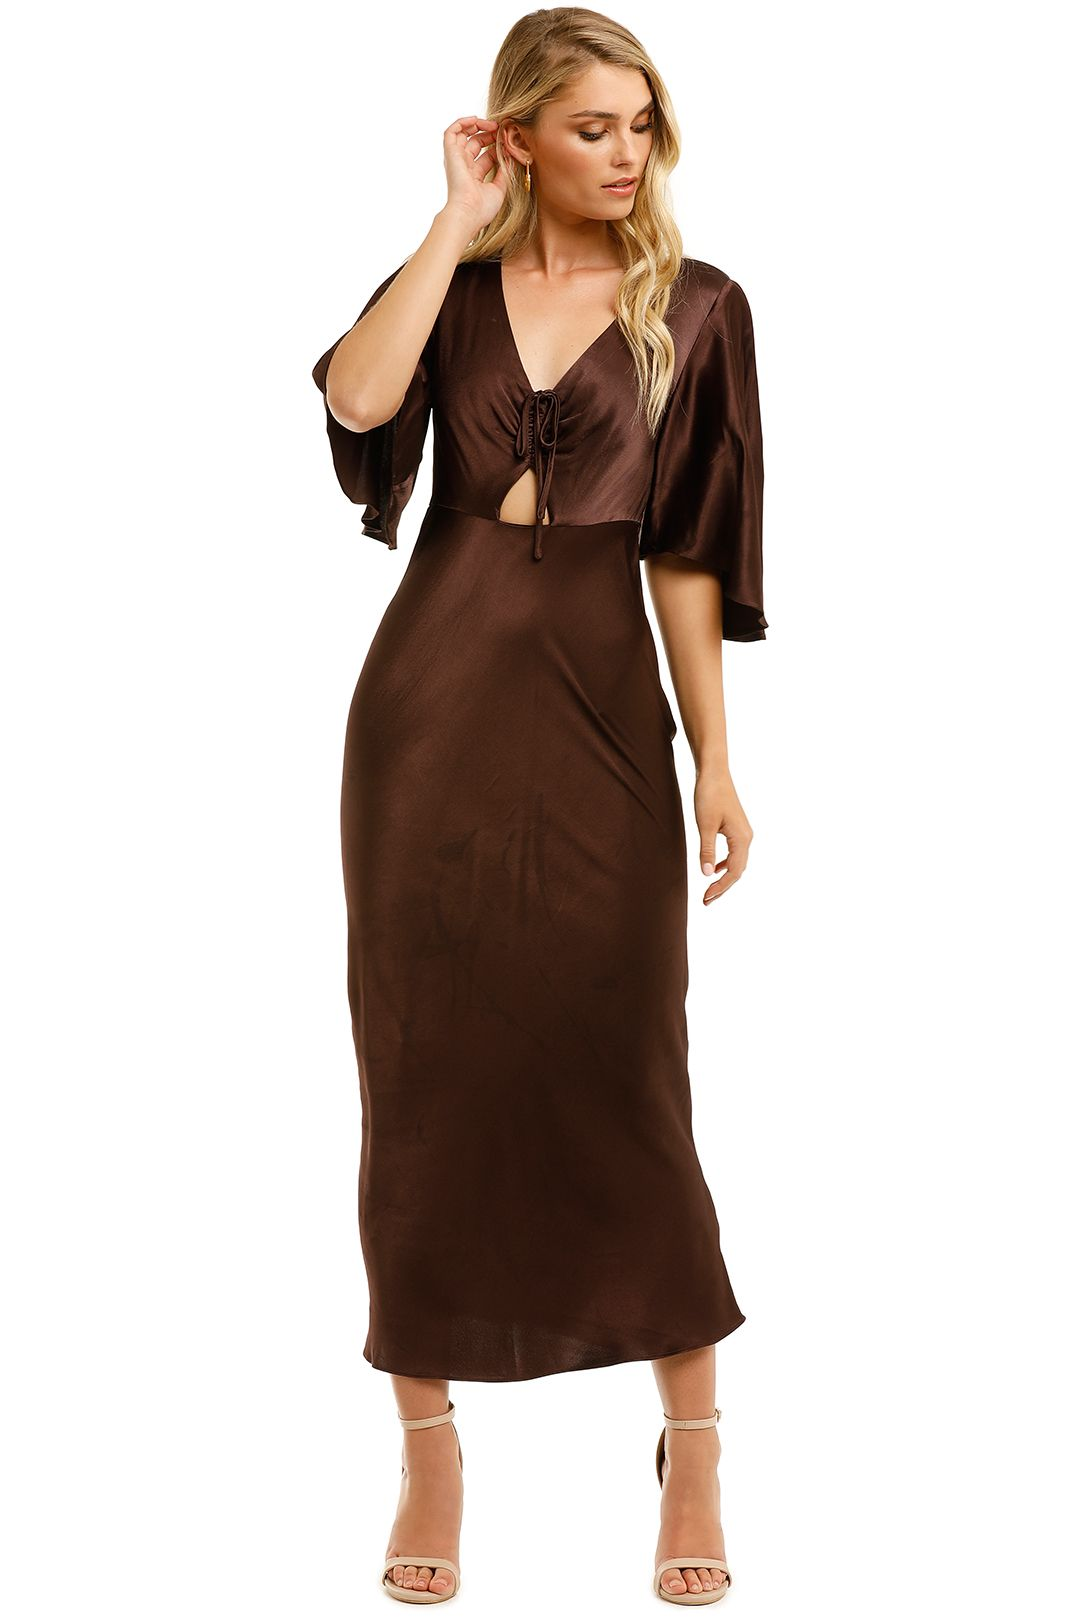 Shona-Joy-Wright-Flutter-Sleeve-Bias-Midi-Dress-Espresso-Front